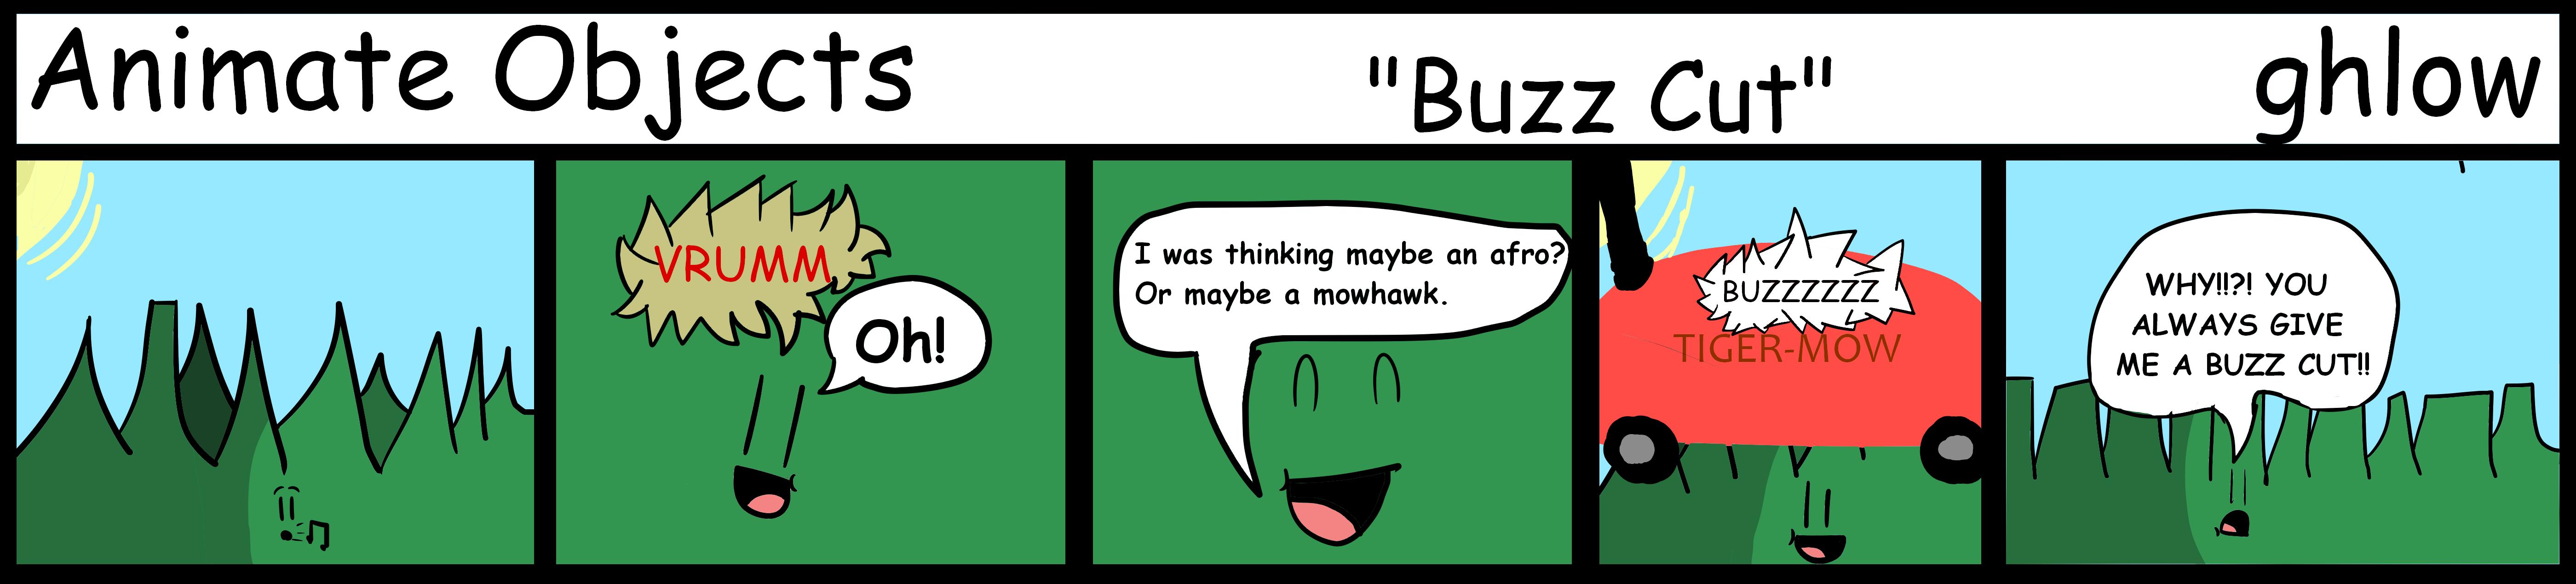 Animate Objects - Buzz Cut